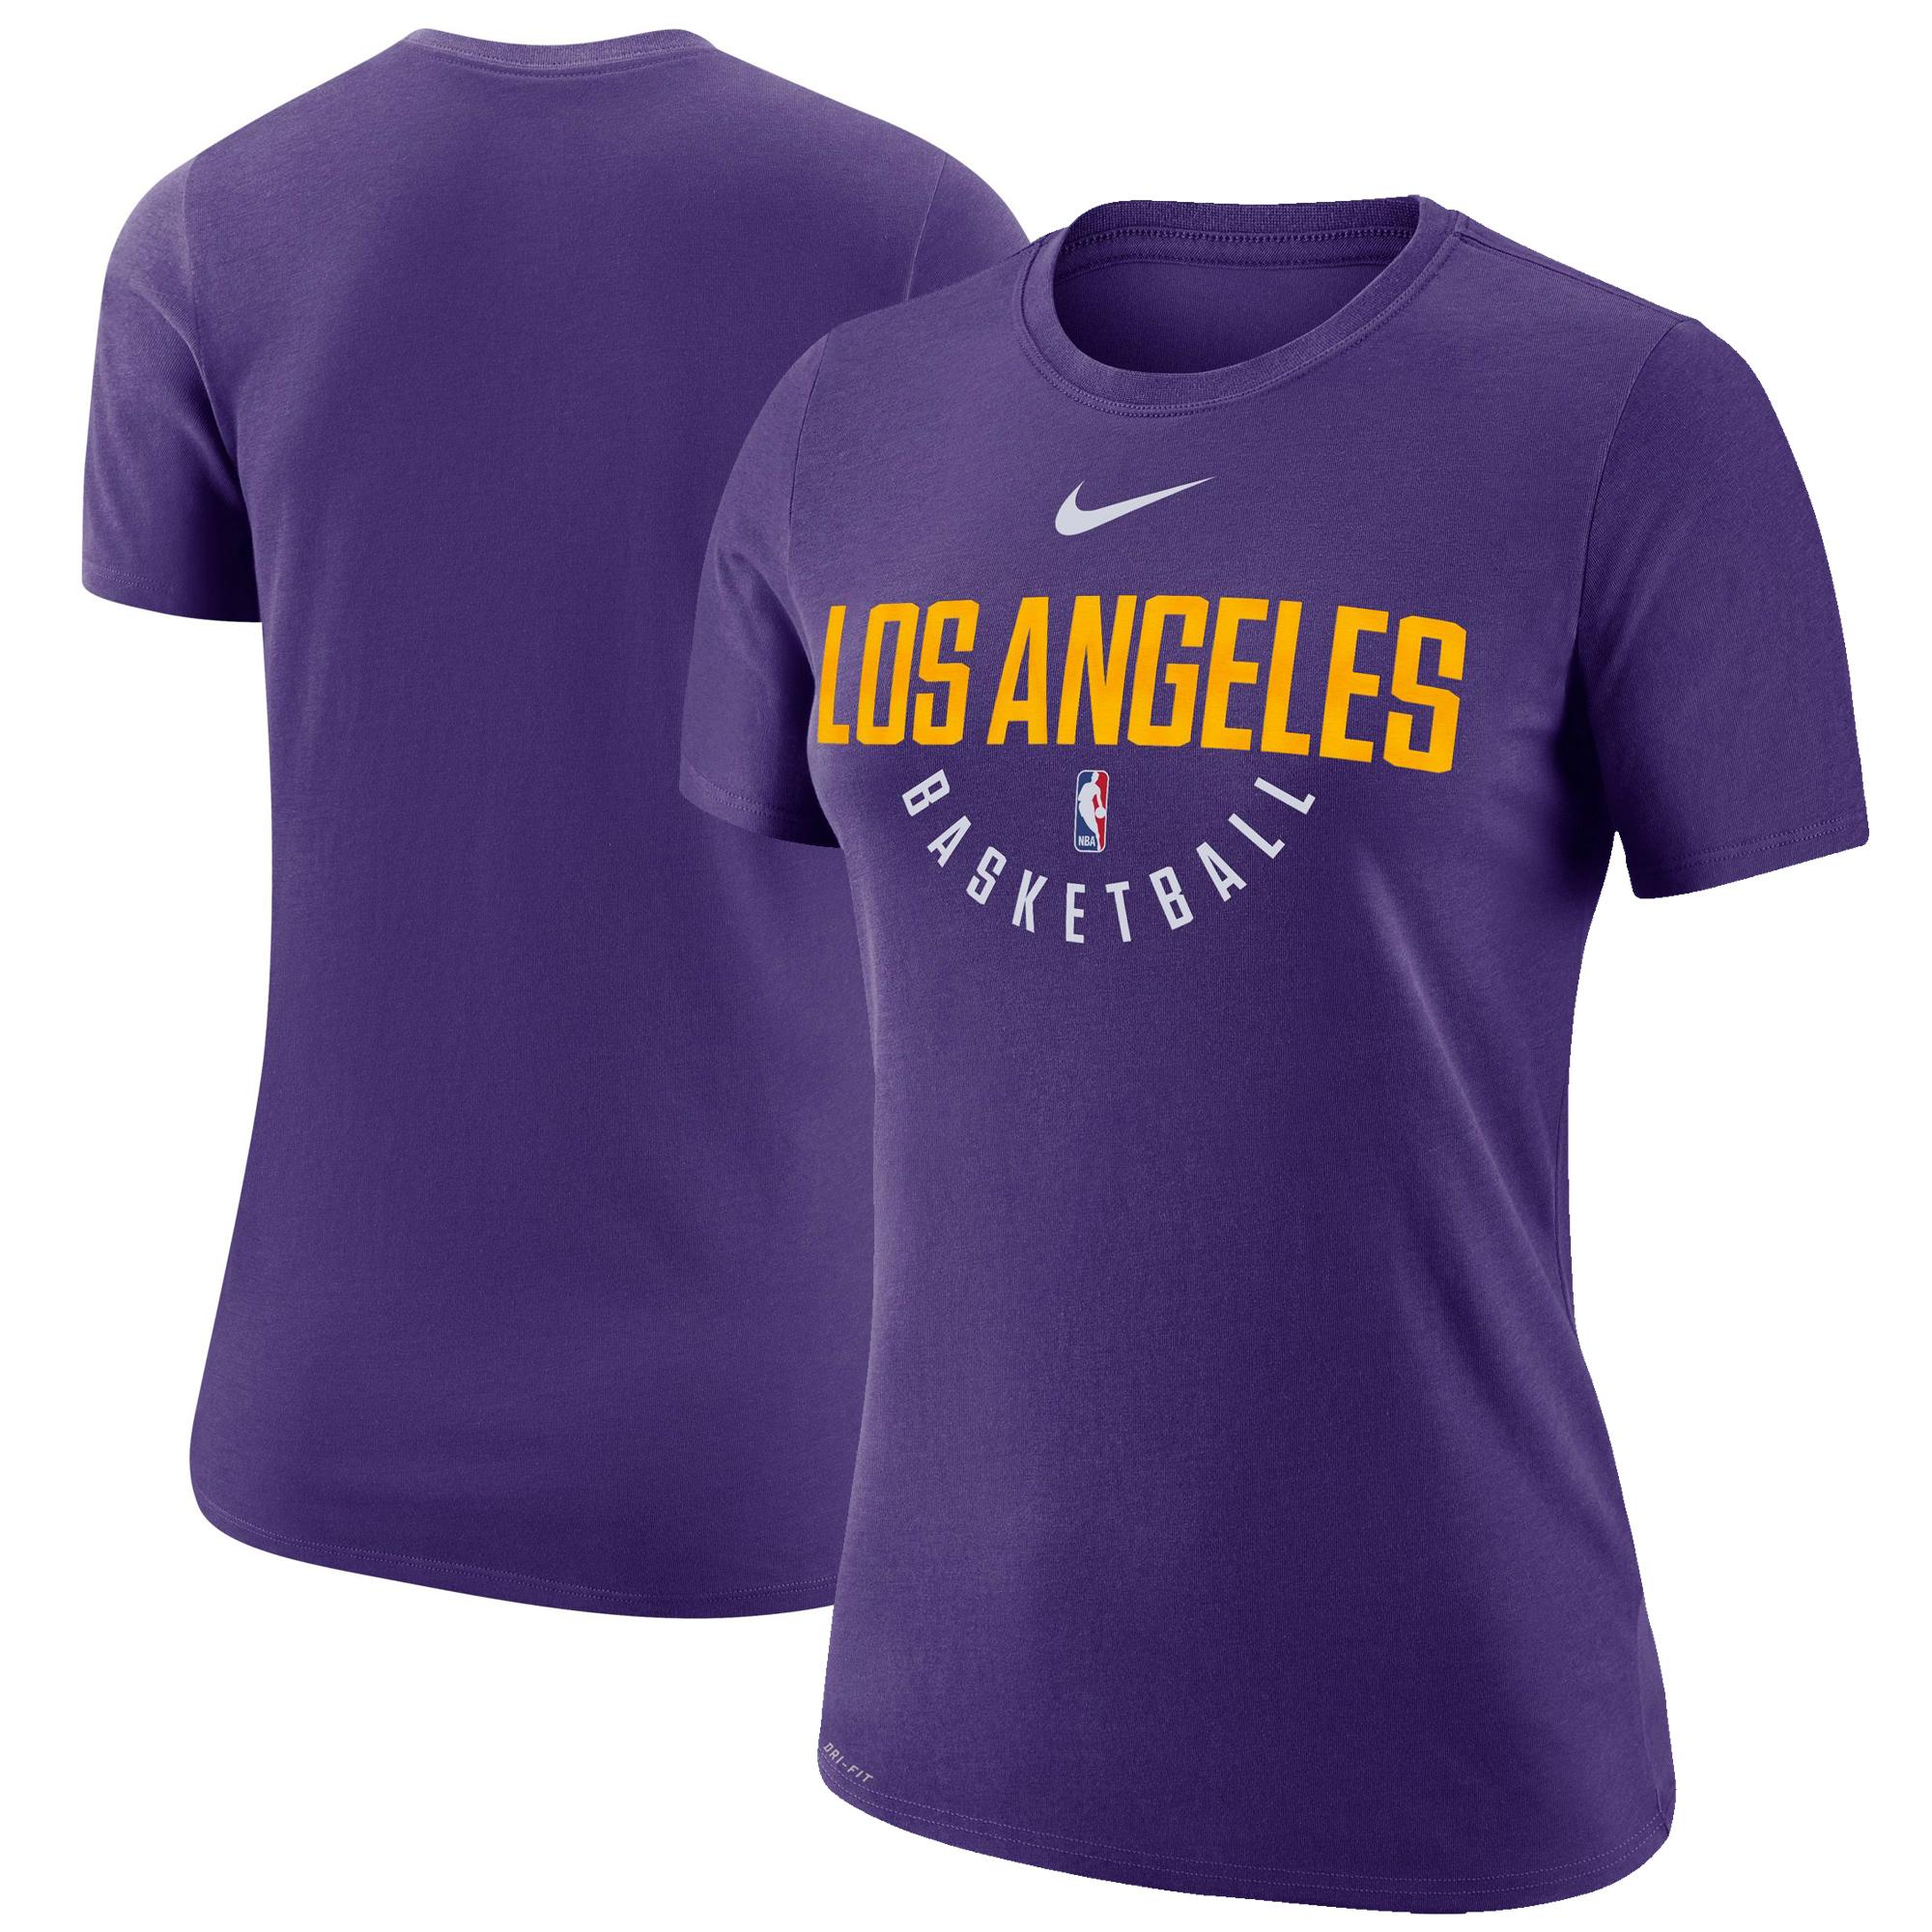 Los Angeles Lakers Nike Women's Practice Performance T-Shirt - Purple